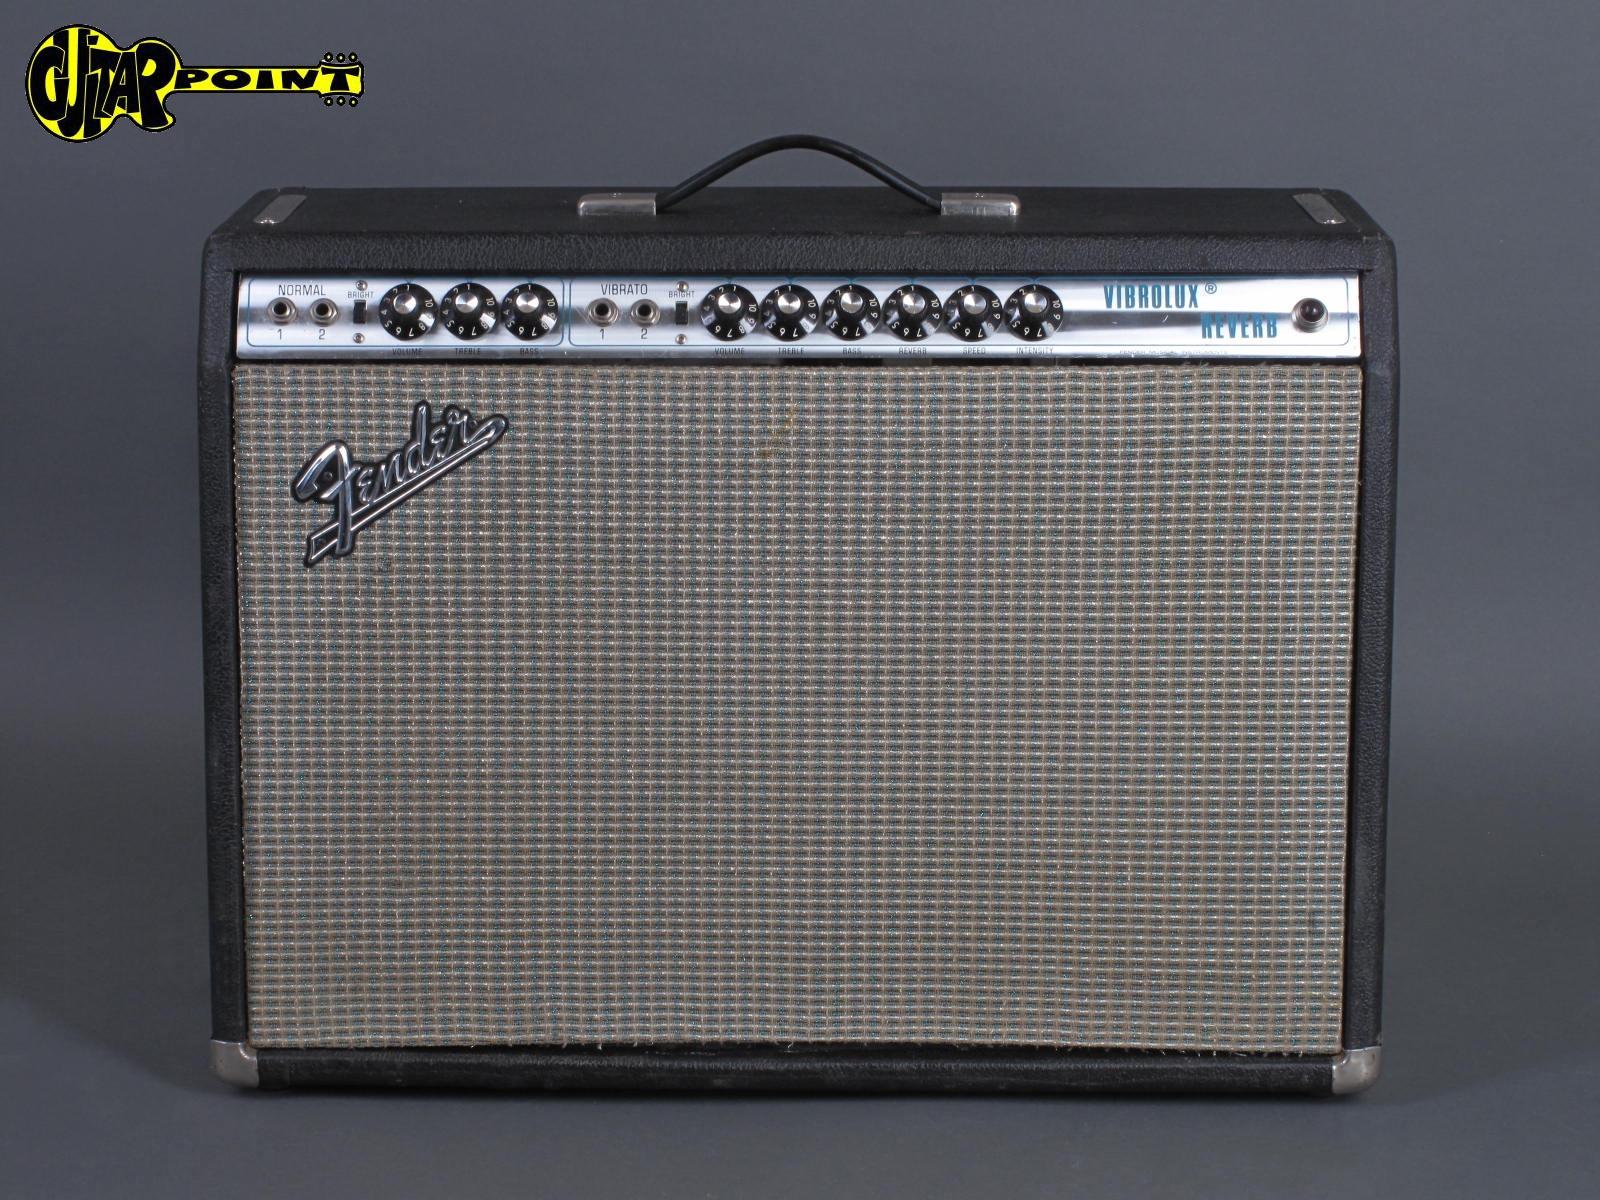 1971 Fender Vibrolux  Reverb Amp  ...Excellent !